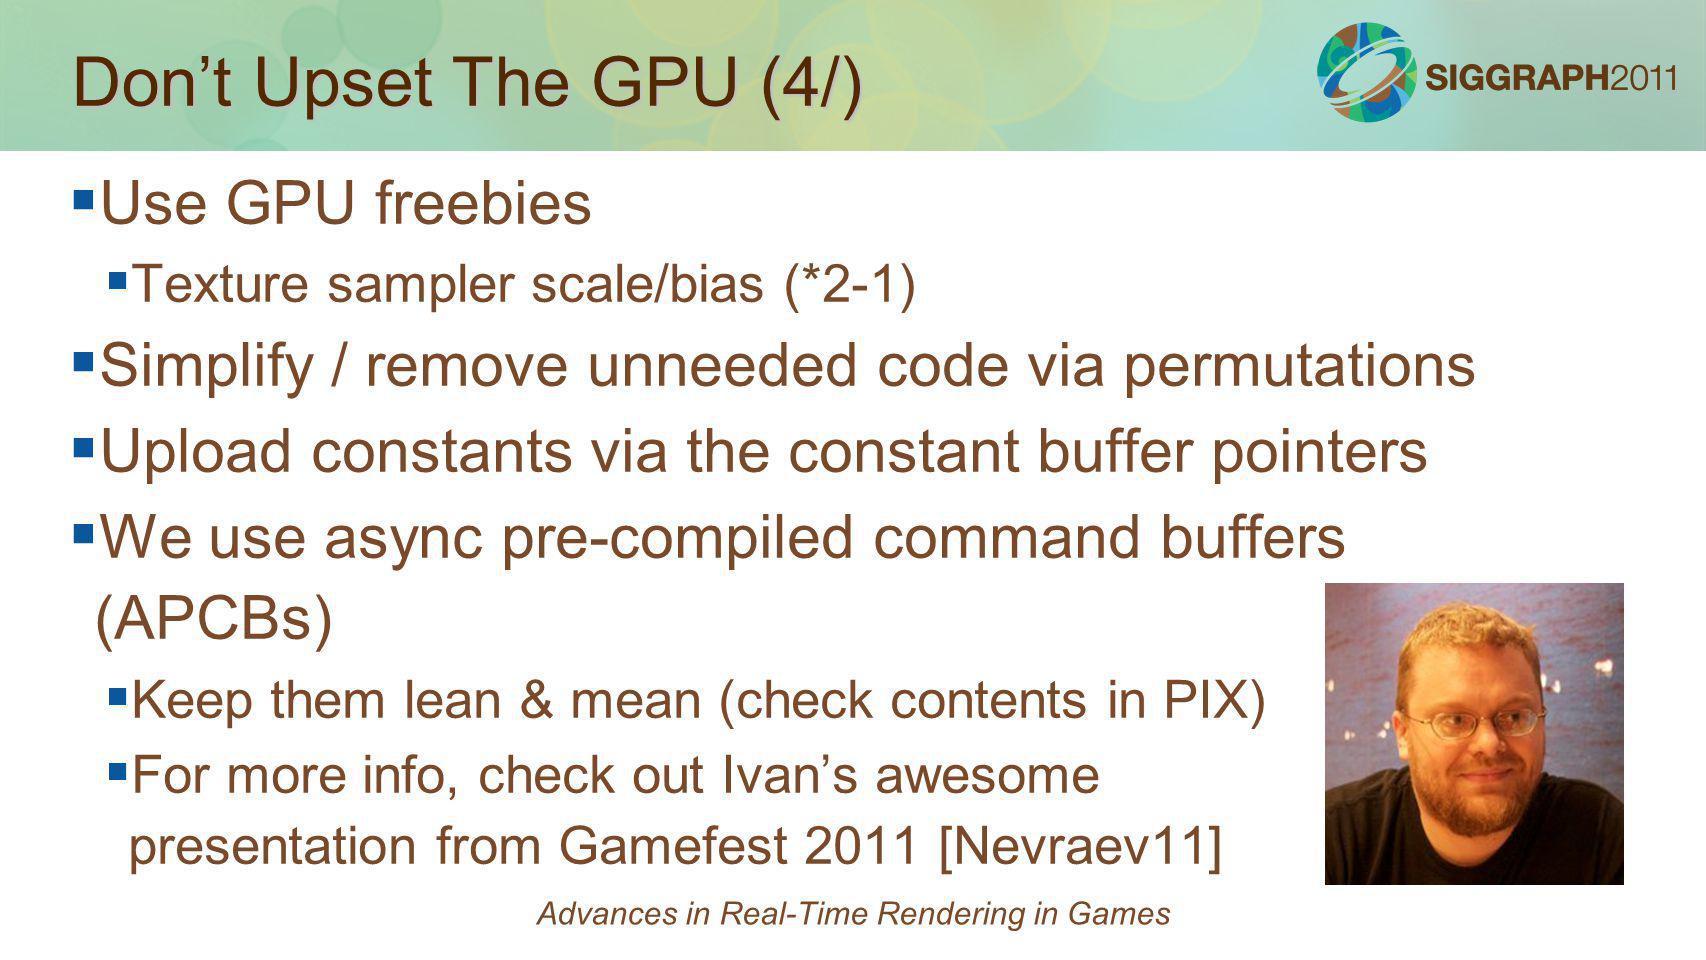 Dont Upset The GPU (4/) Use GPU freebies Texture sampler scale/bias (*2-1) Simplify / remove unneeded code via permutations Upload constants via the c